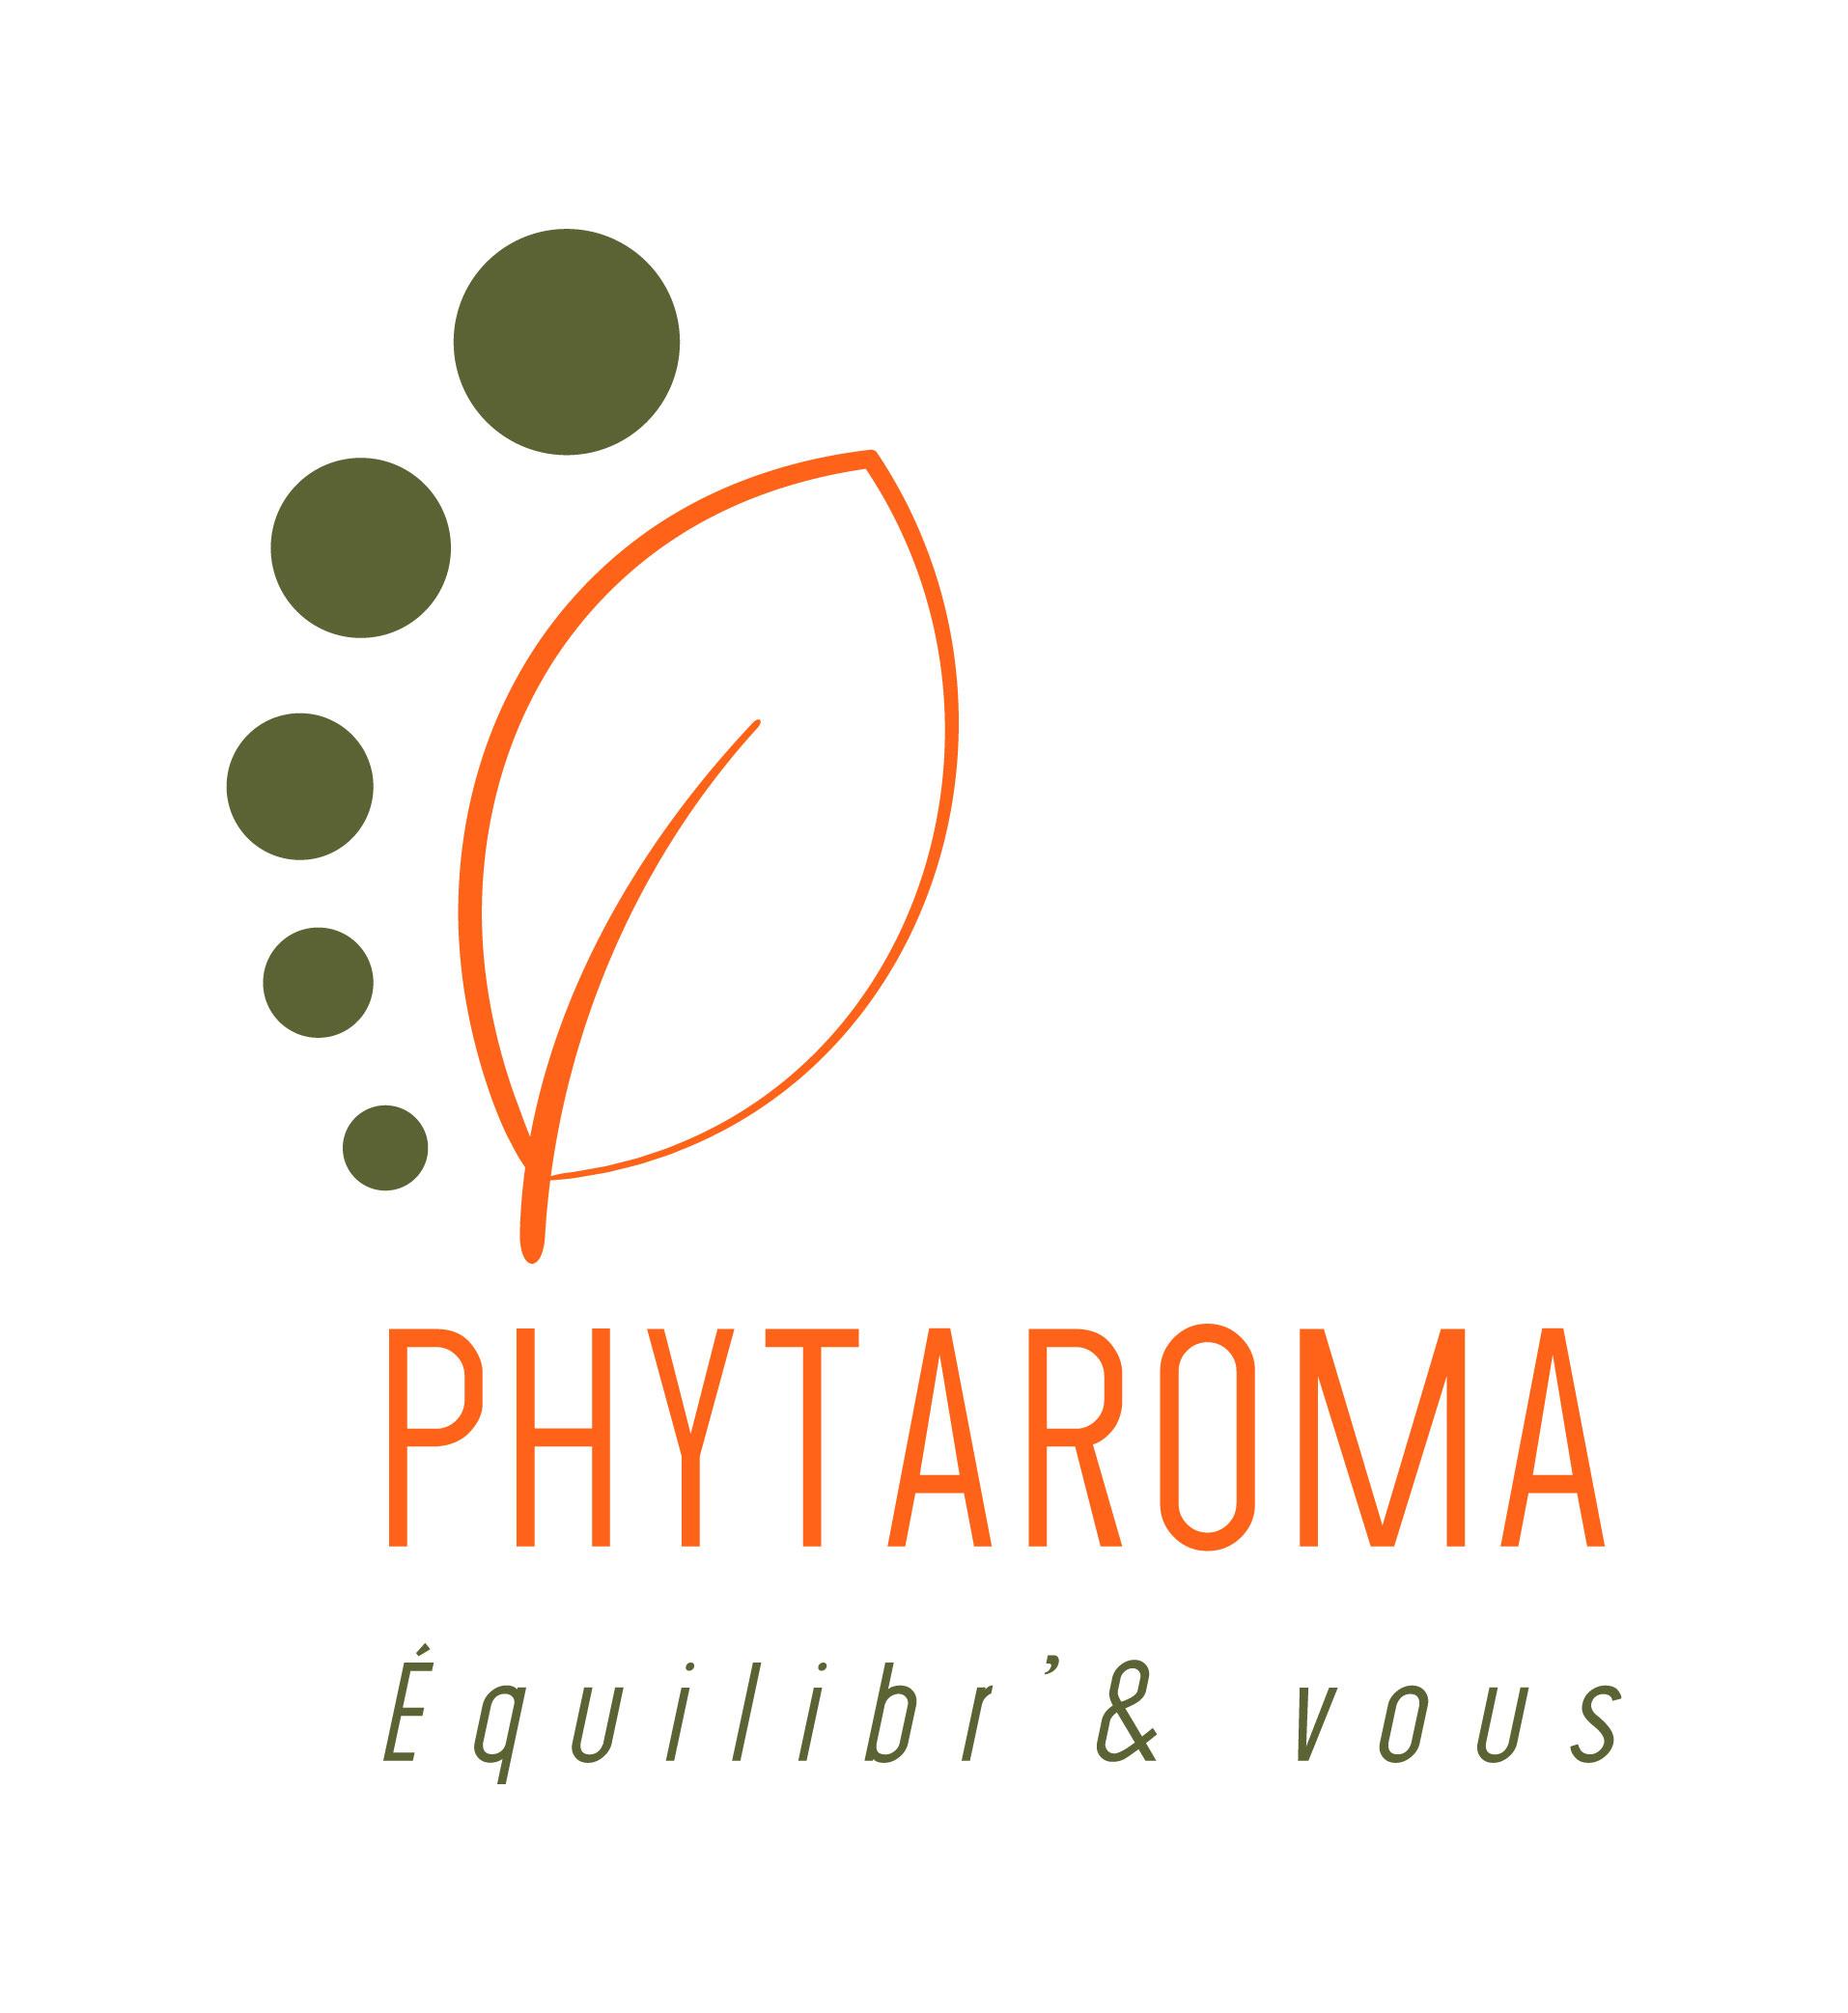 Phytaroma_logo_BASIC_RVB-01.jpg